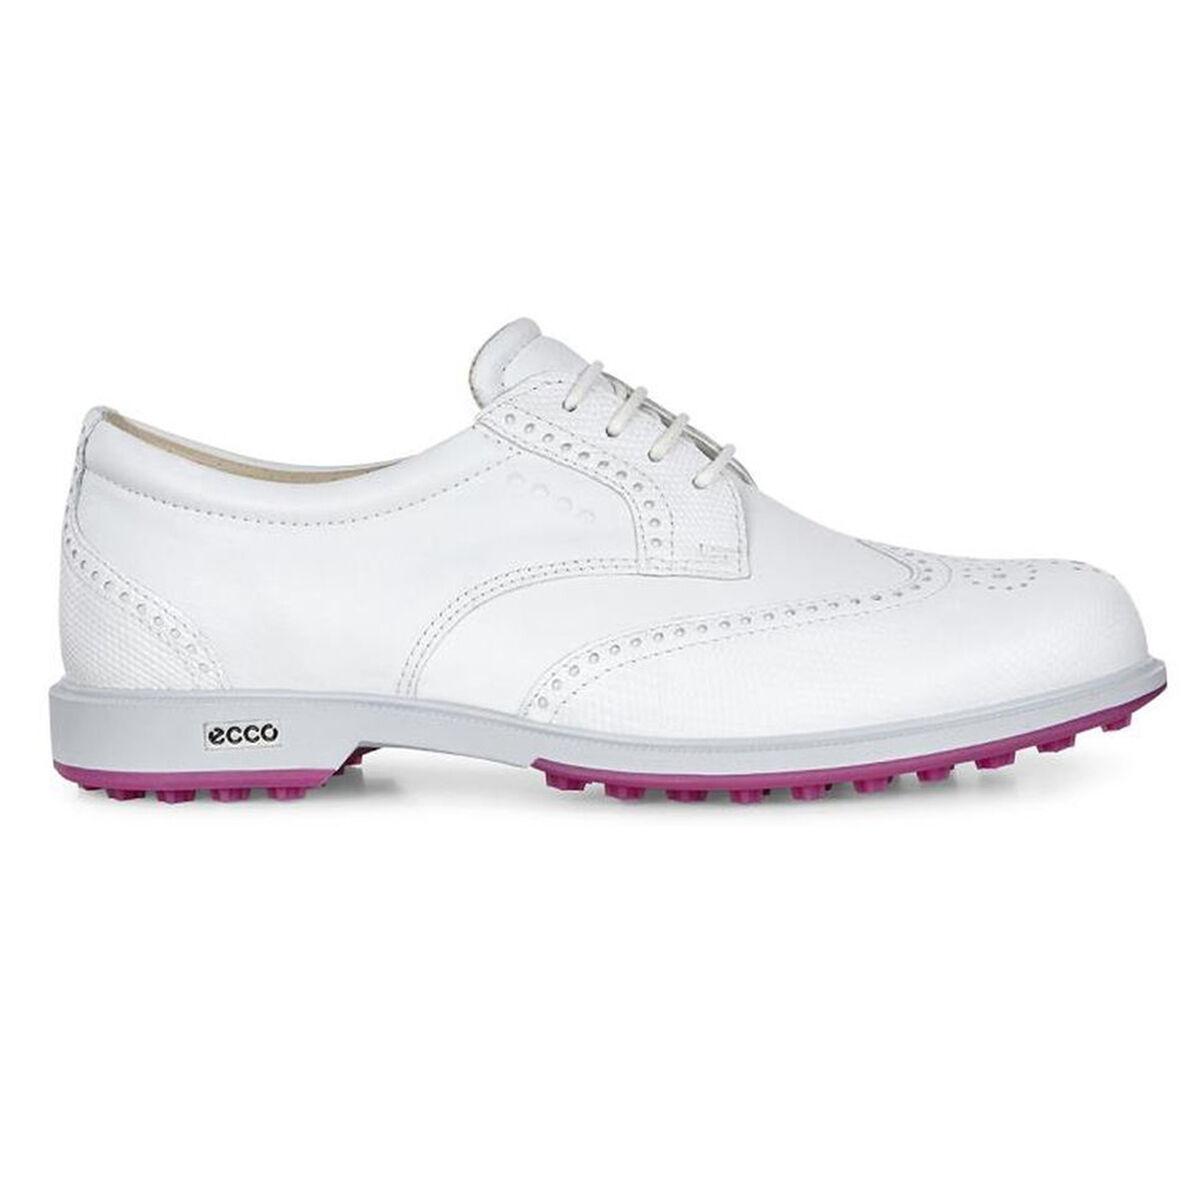 cb2aa647ec ECCO Tour Hybrid Women's Golf Shoe - White